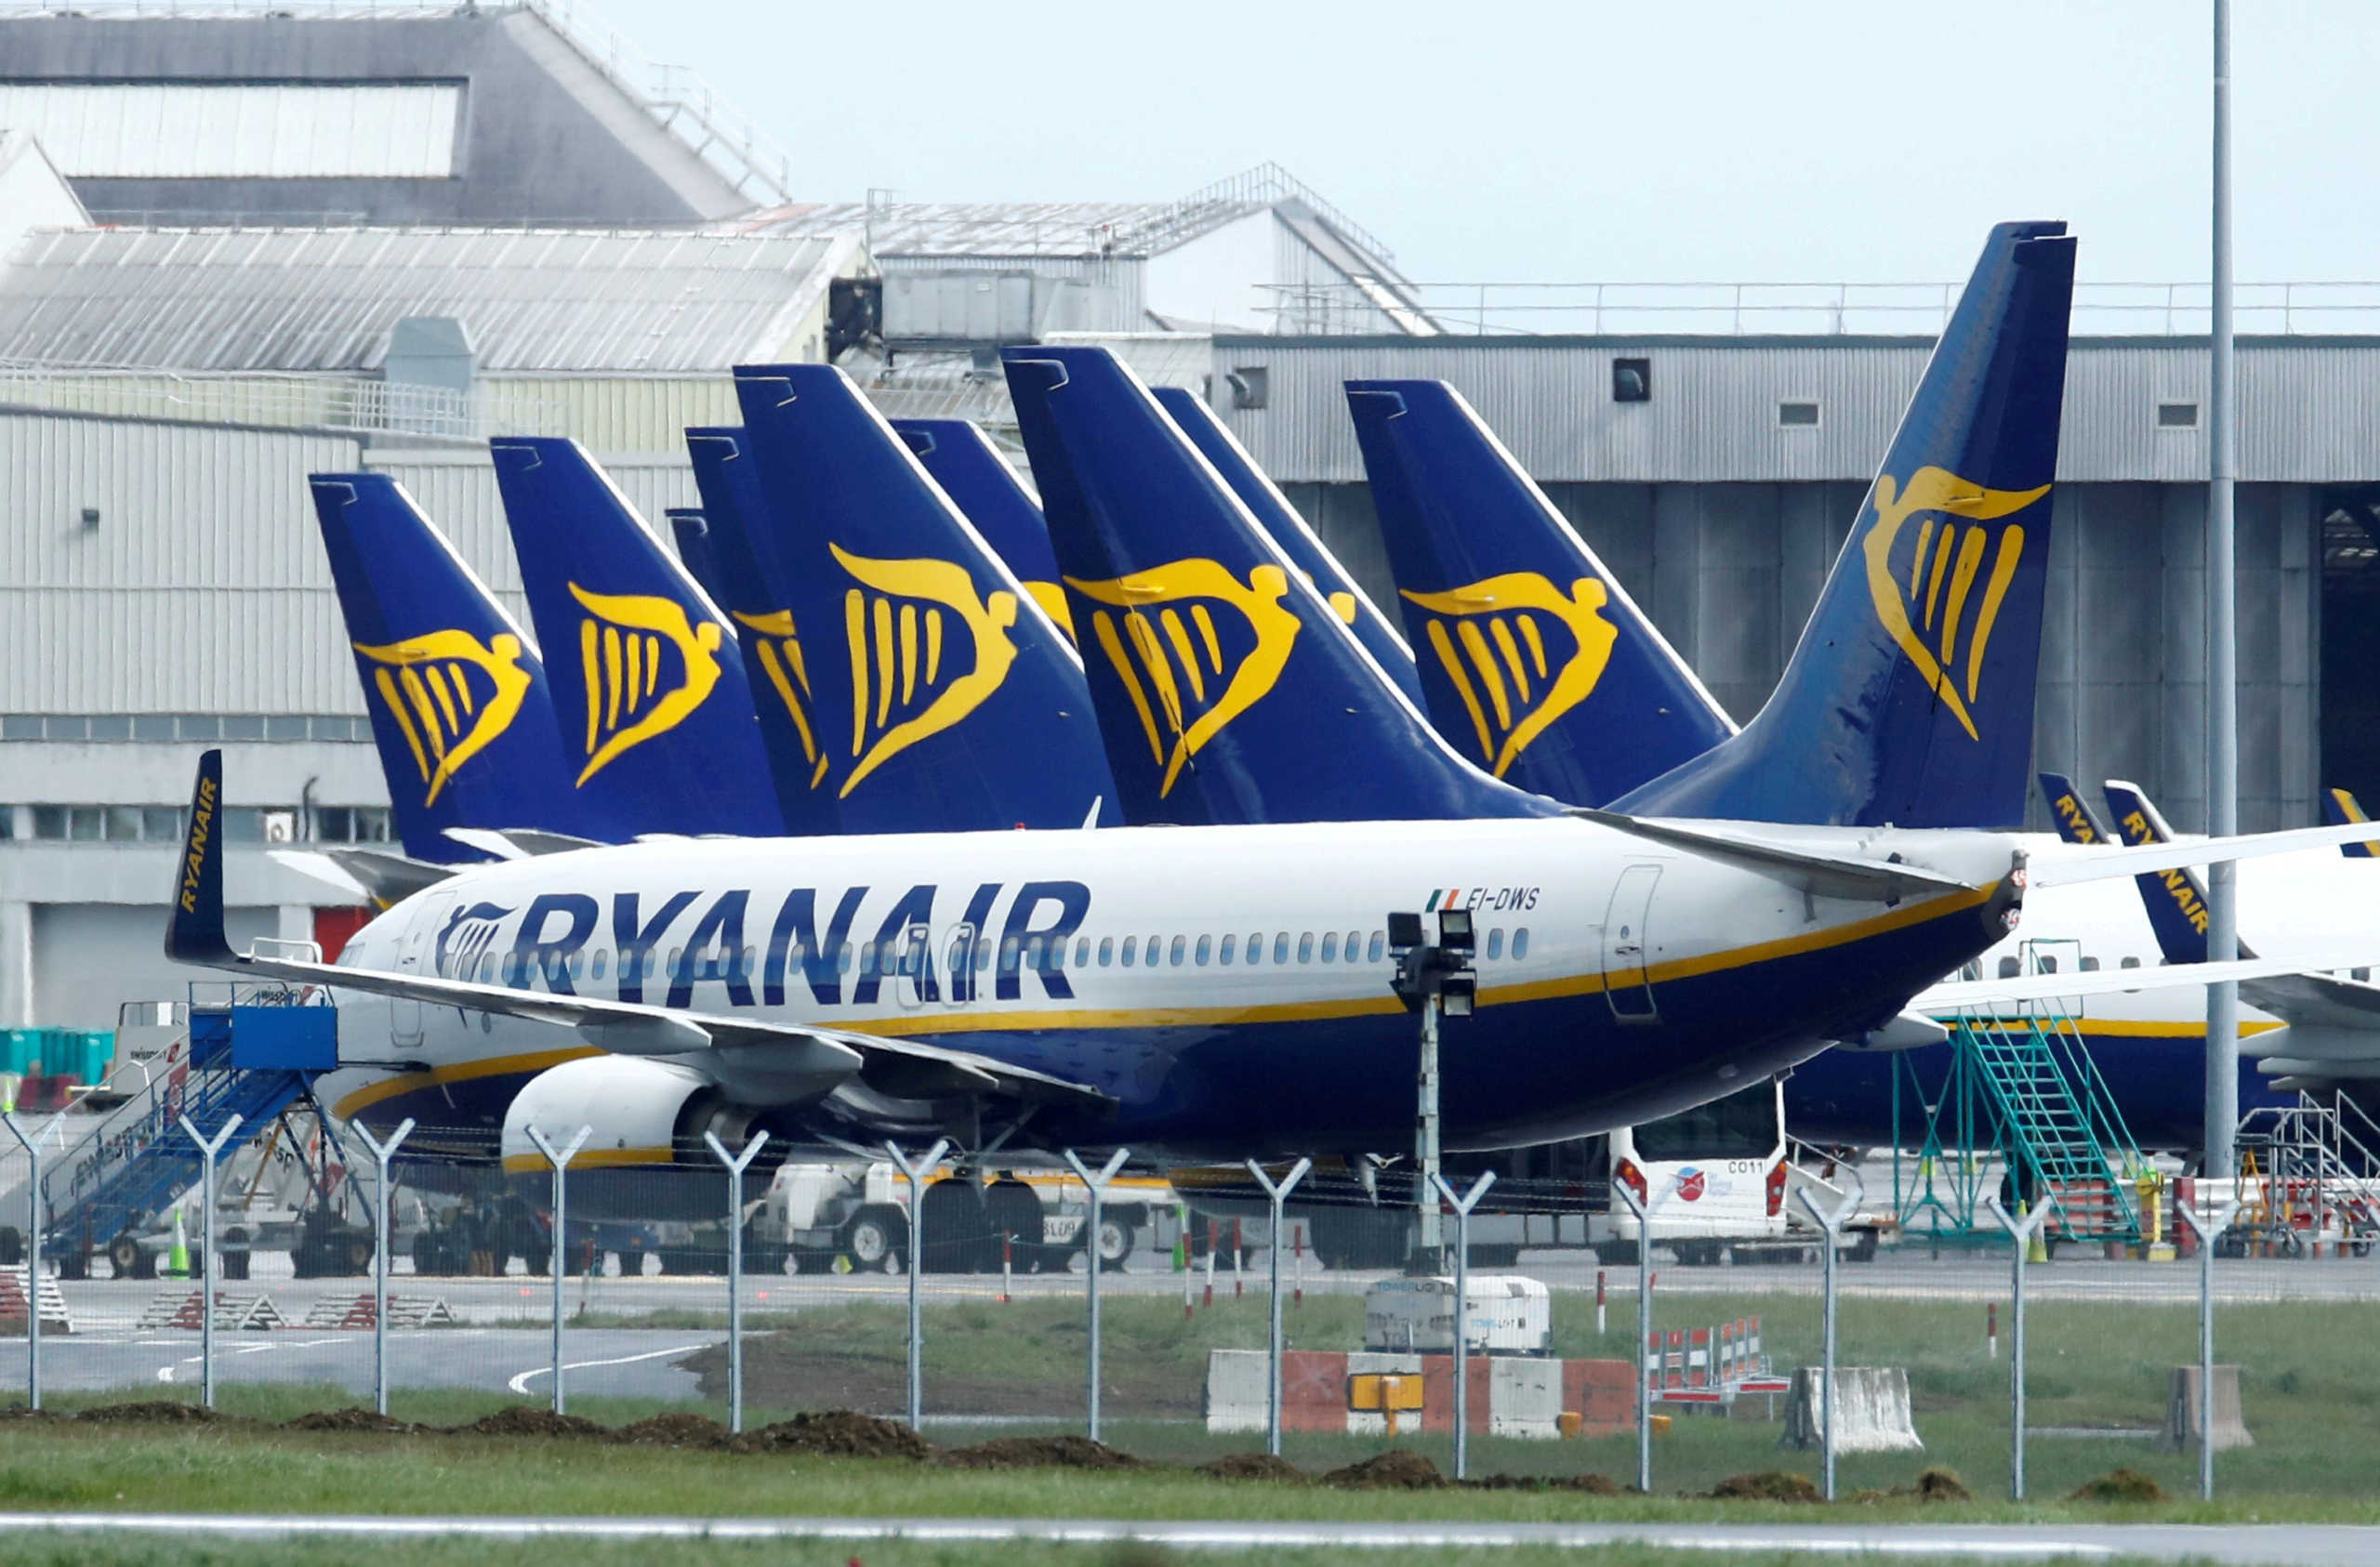 Ryanair: Κλείνει τη βάση στην Φρανκφούρτη επειδή οι πιλότοι δε δέχτηκαν μείωση μισθού